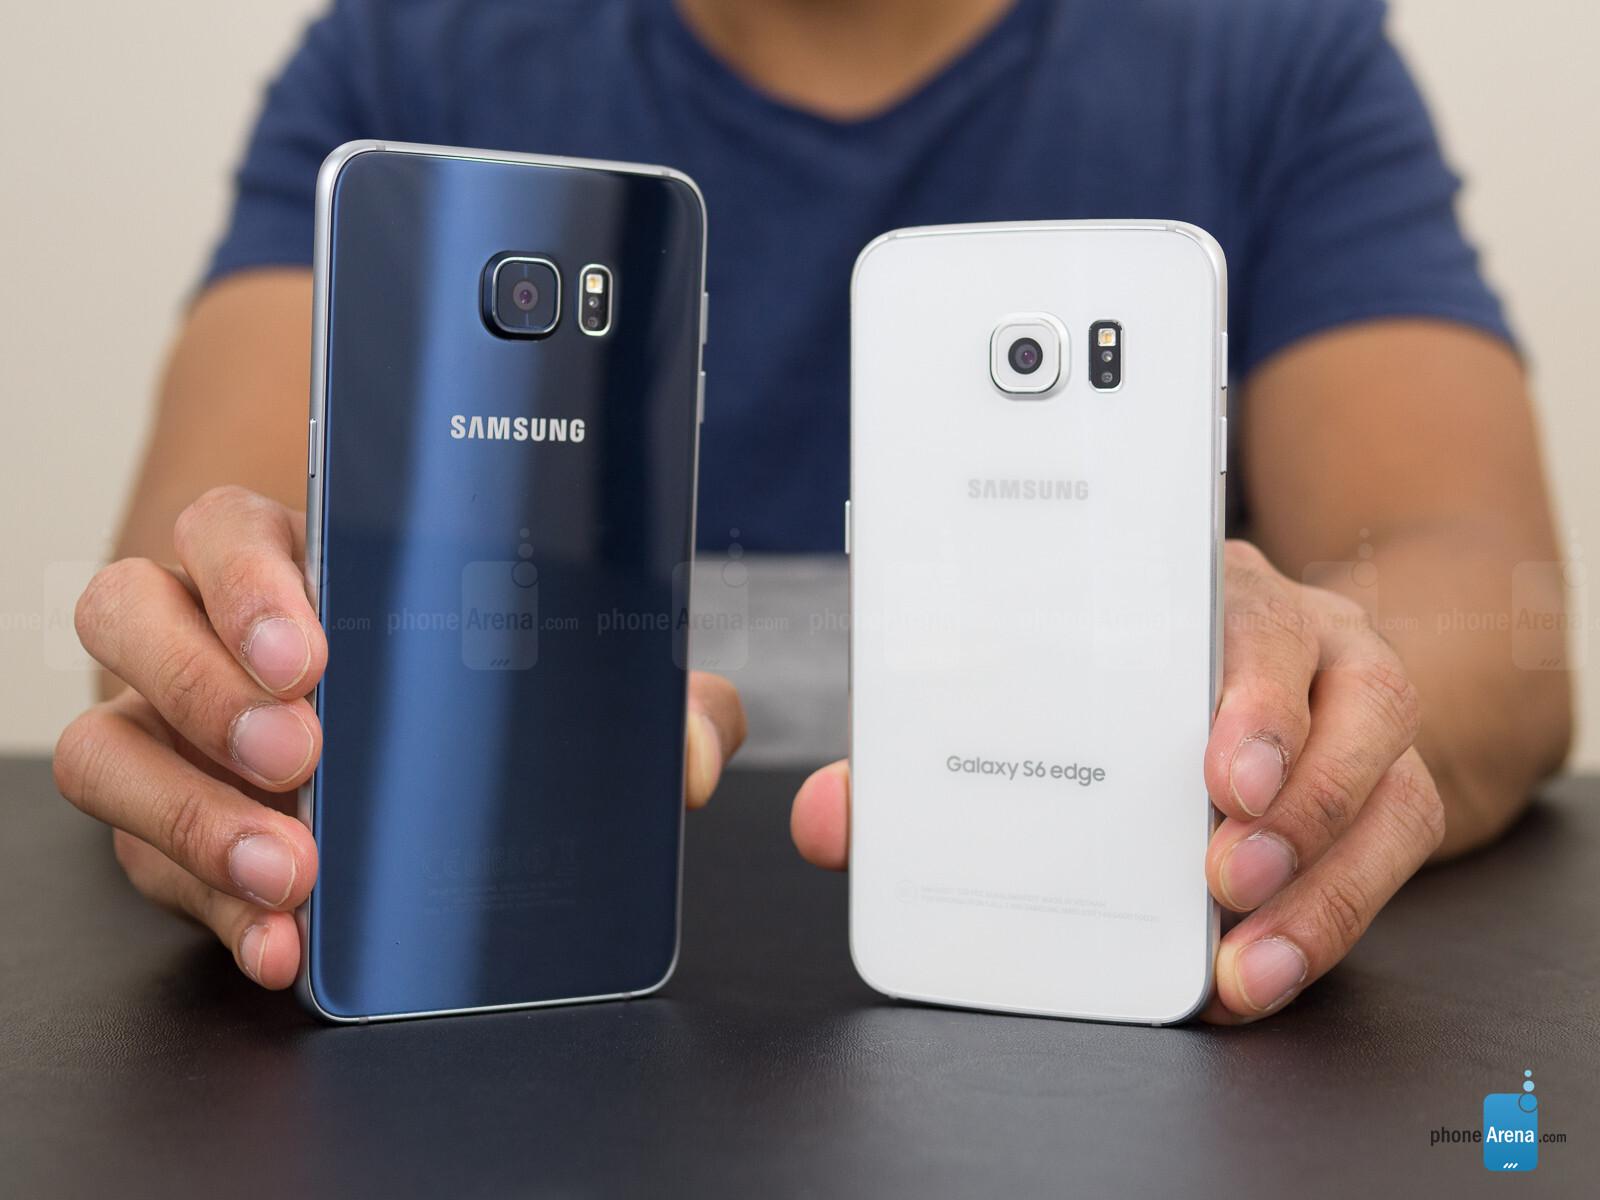 Samsung Galaxy S6 edge+ vs Samsung Galaxy S6 edge